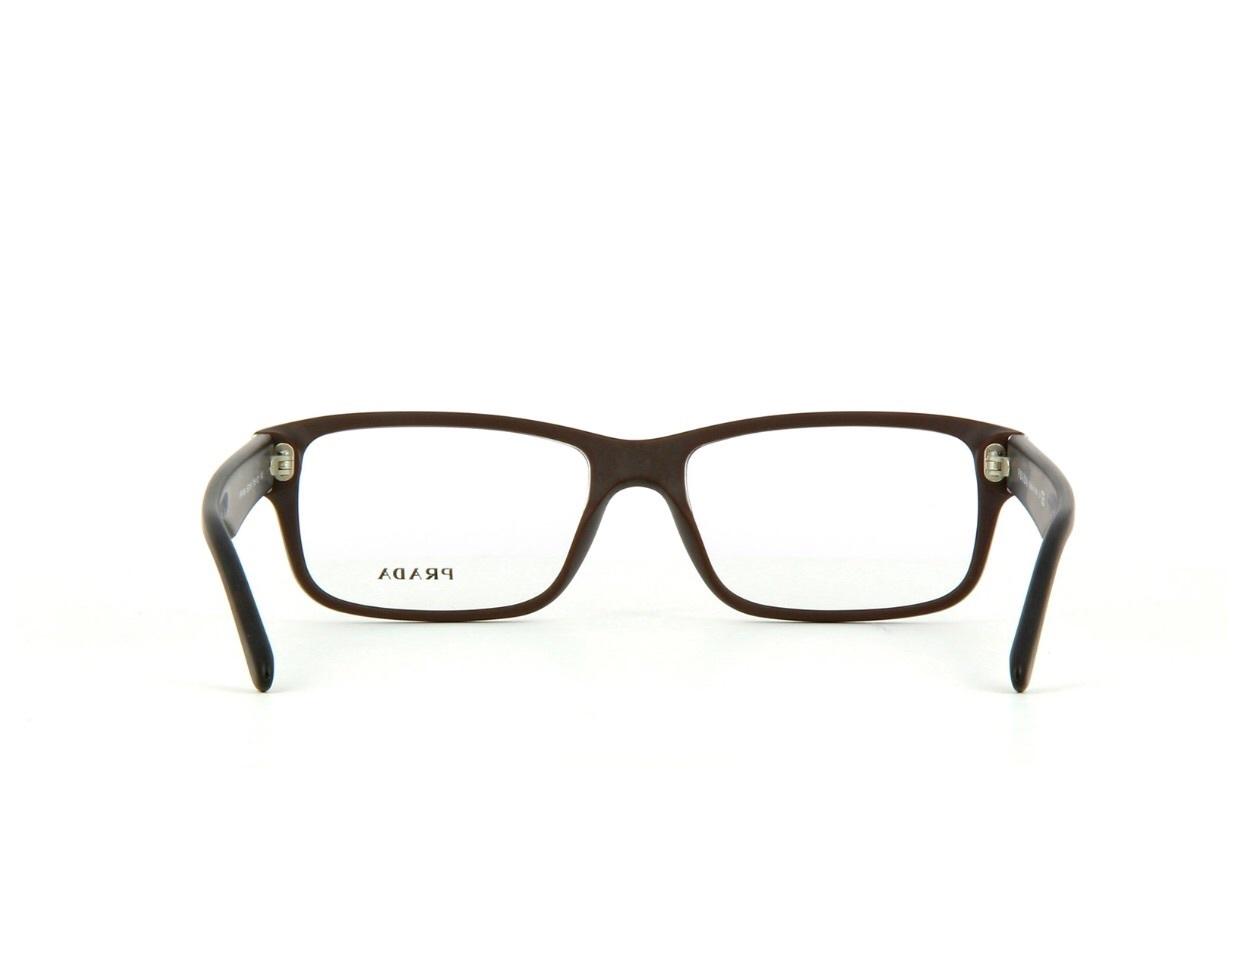 d63f57472ad New Authentic Prada PR 16MV TV6101 Matte Brown Eyeglass Frame 53mm